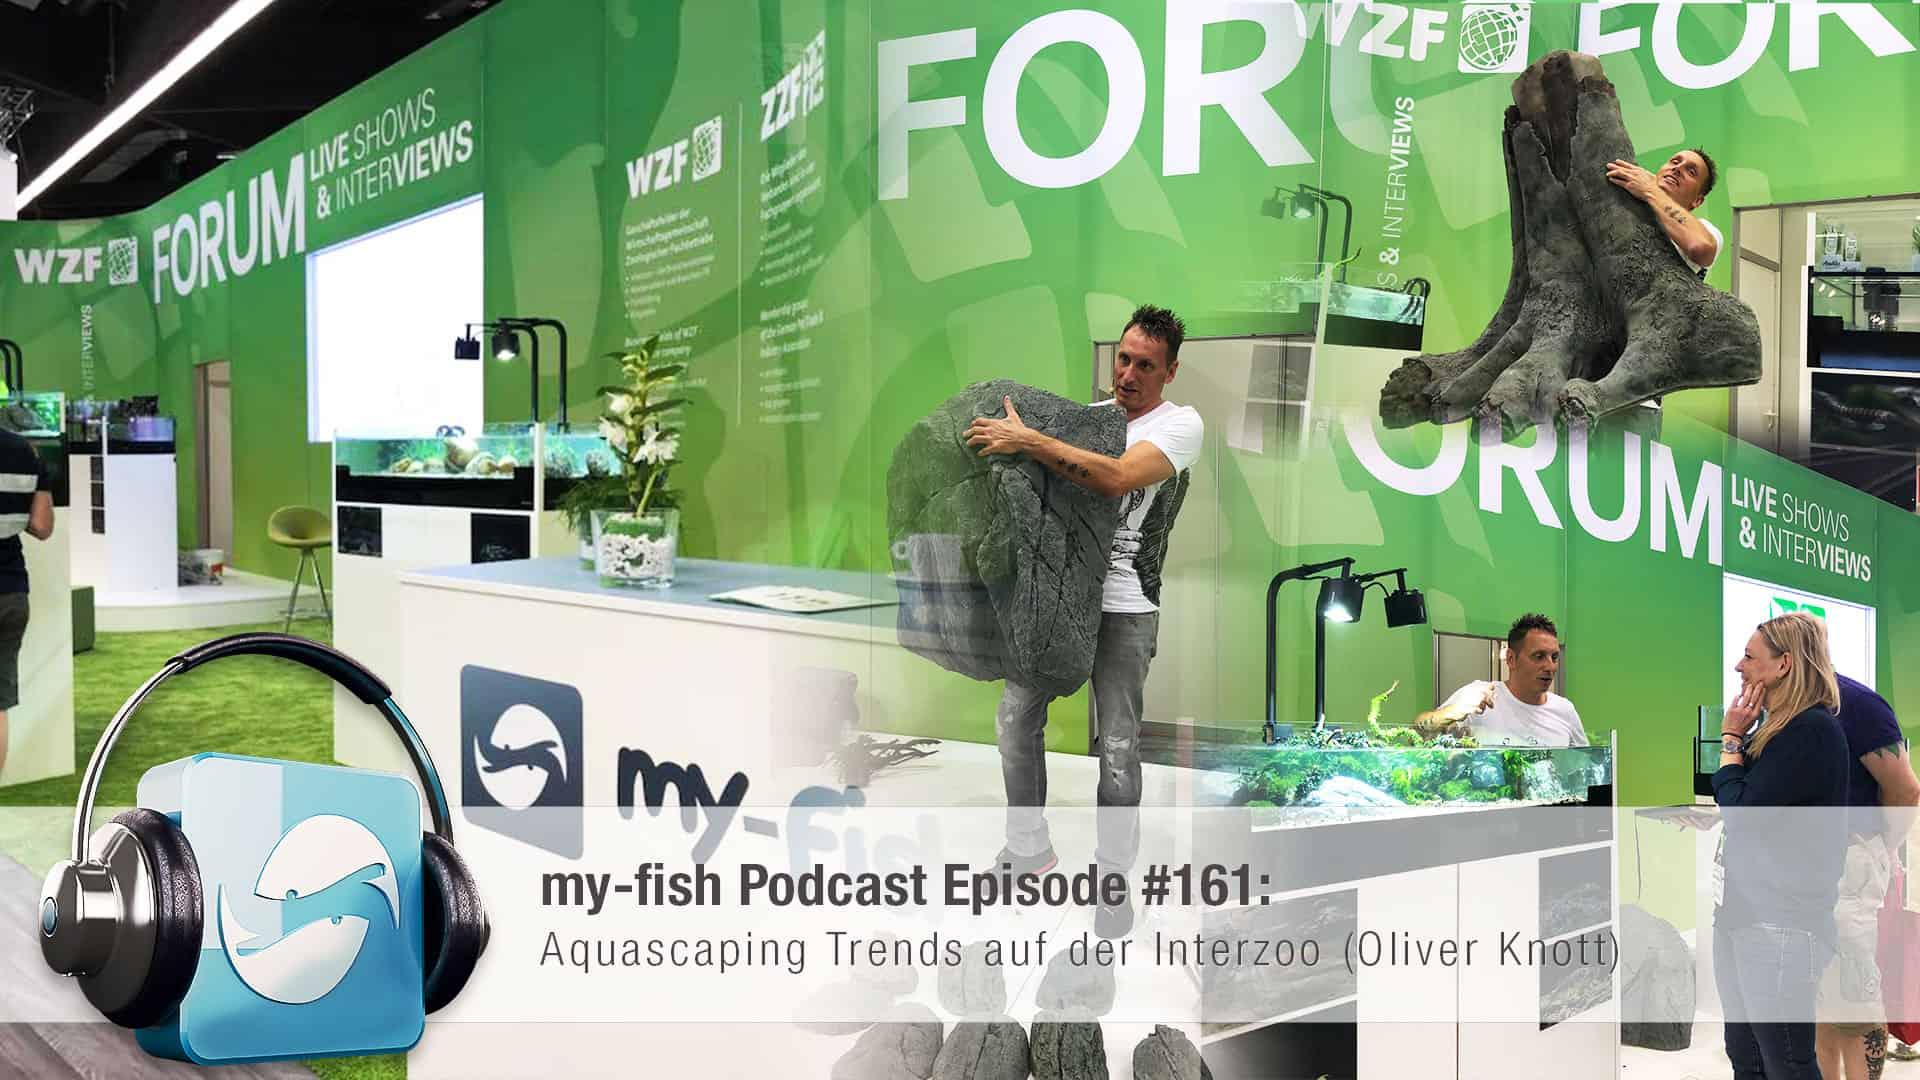 161 Aquascaping Trends auf der Interzoo (Oliver Knott) 1